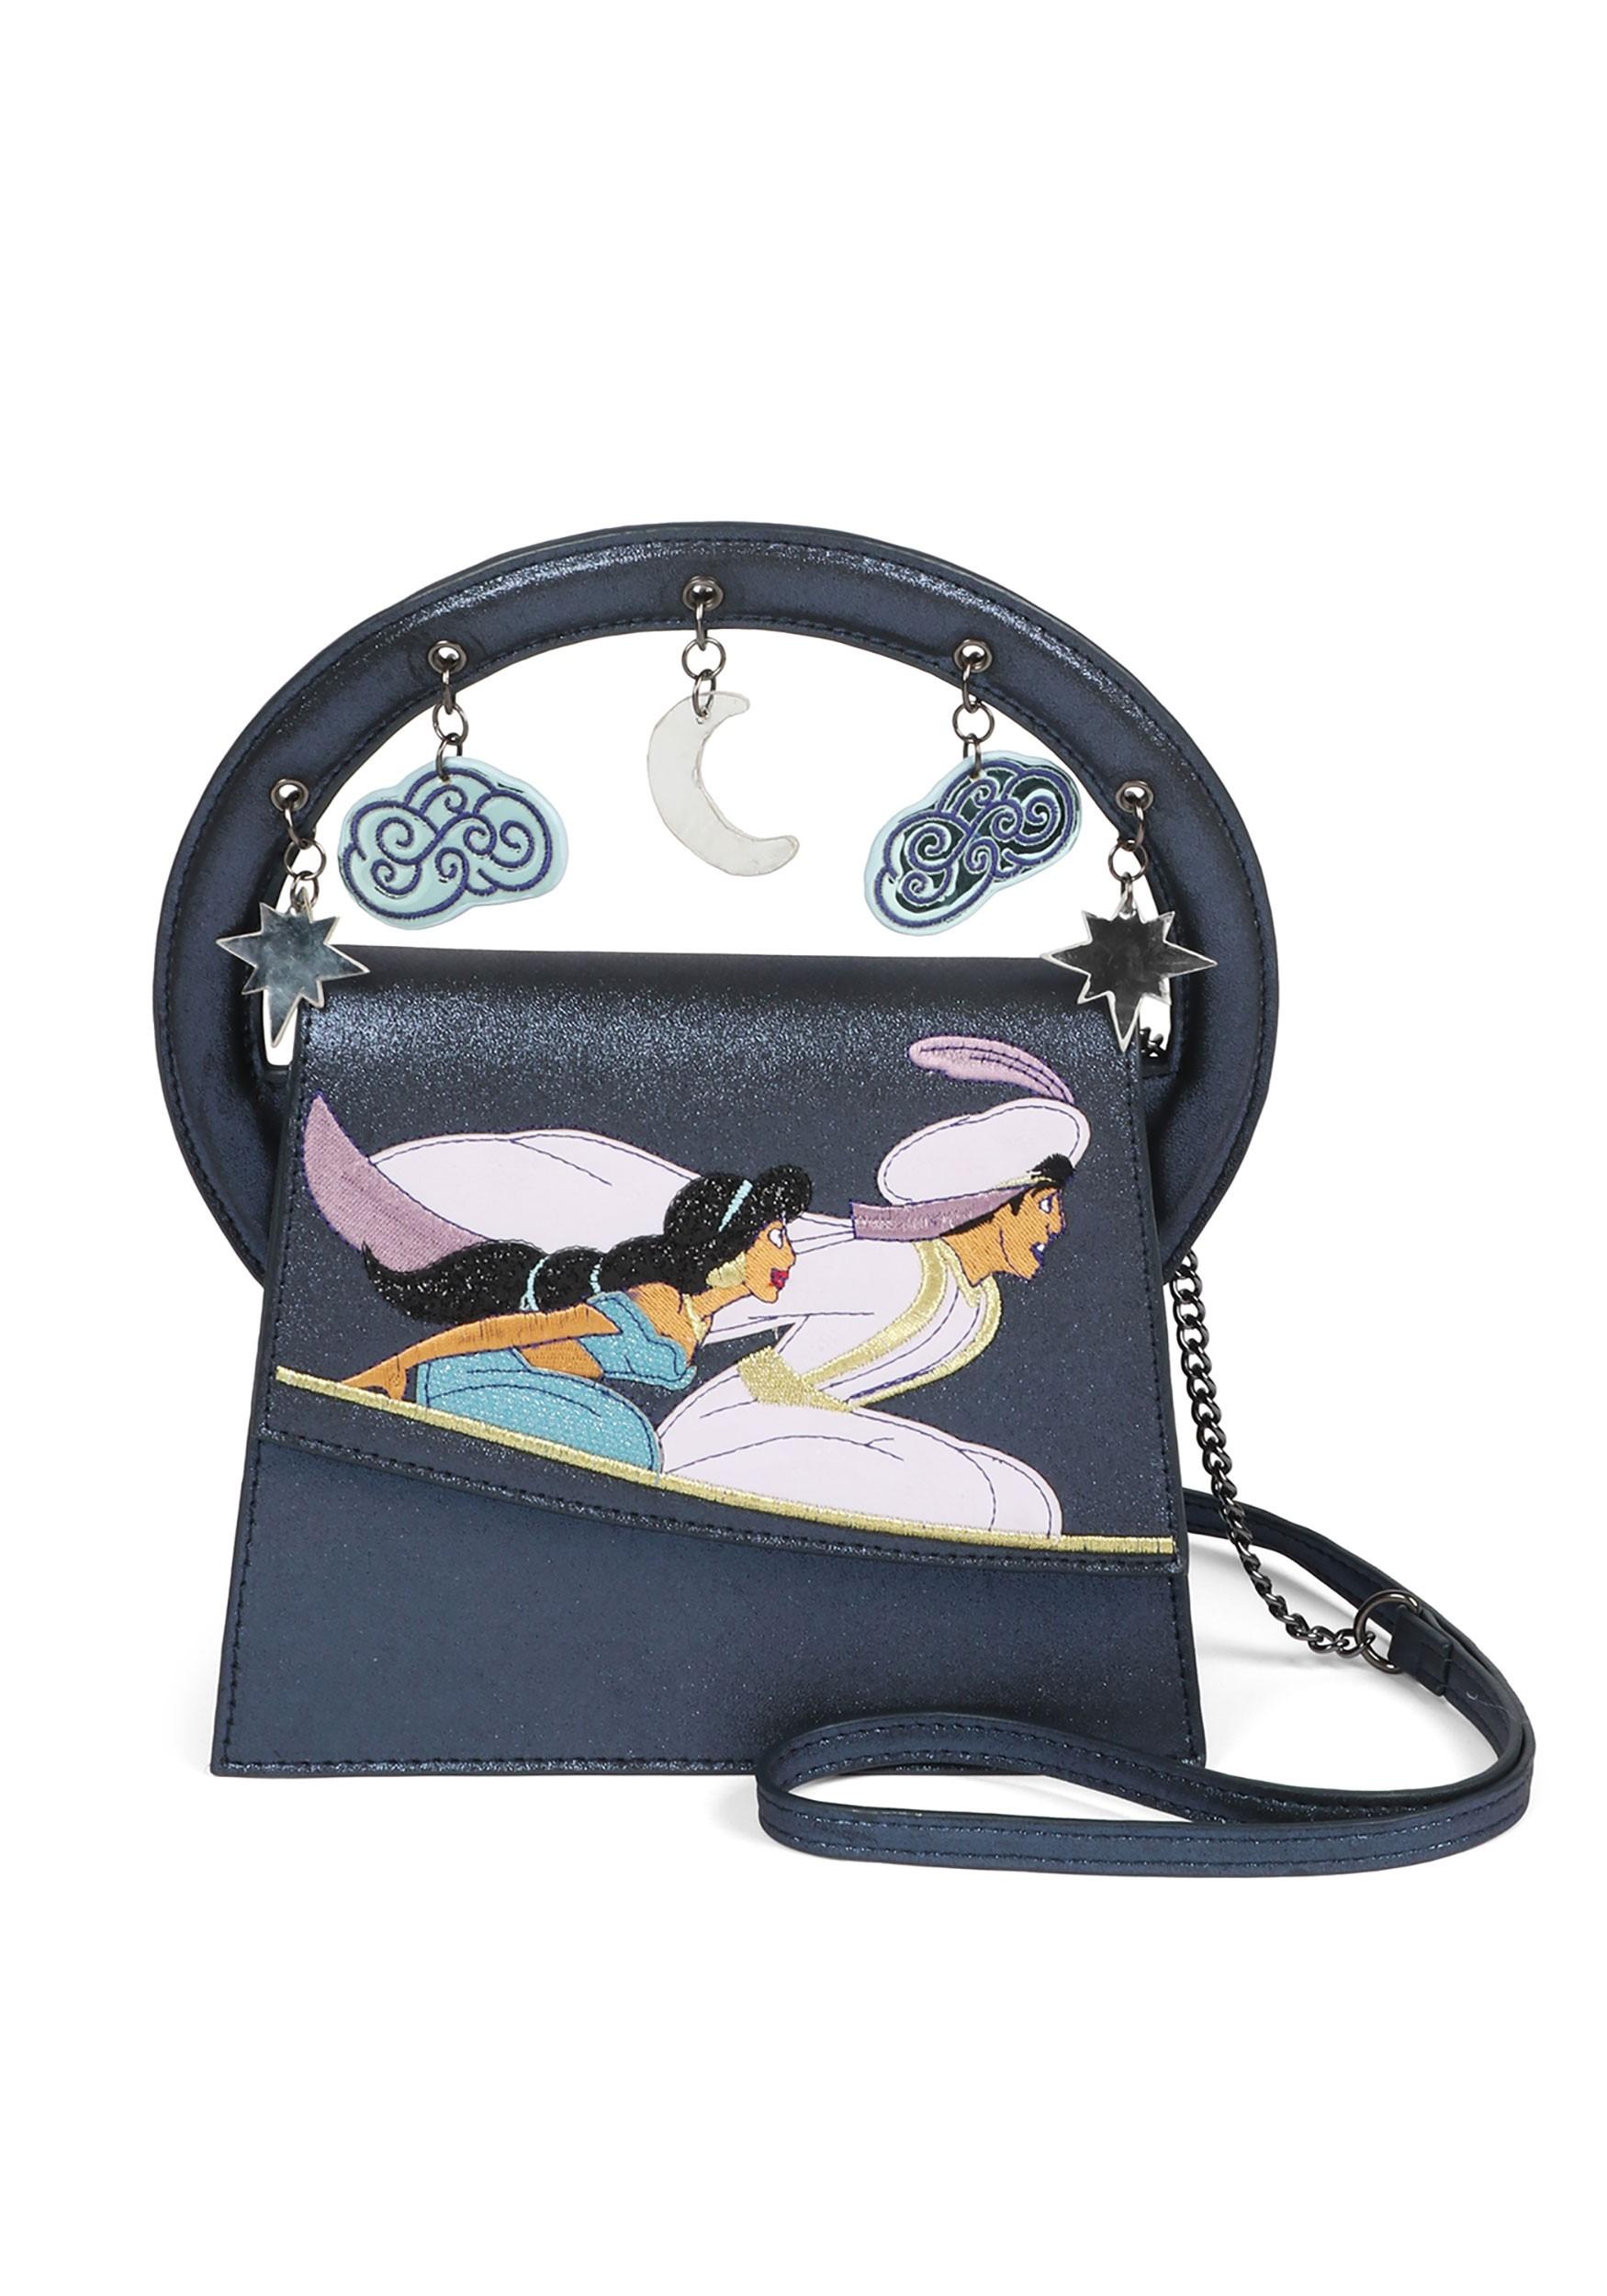 Aladdin Whole New World Crossbody Bag Danielle Nicole Purse (FABNDI19103MLT-ST FABNDI19103MLT) photo